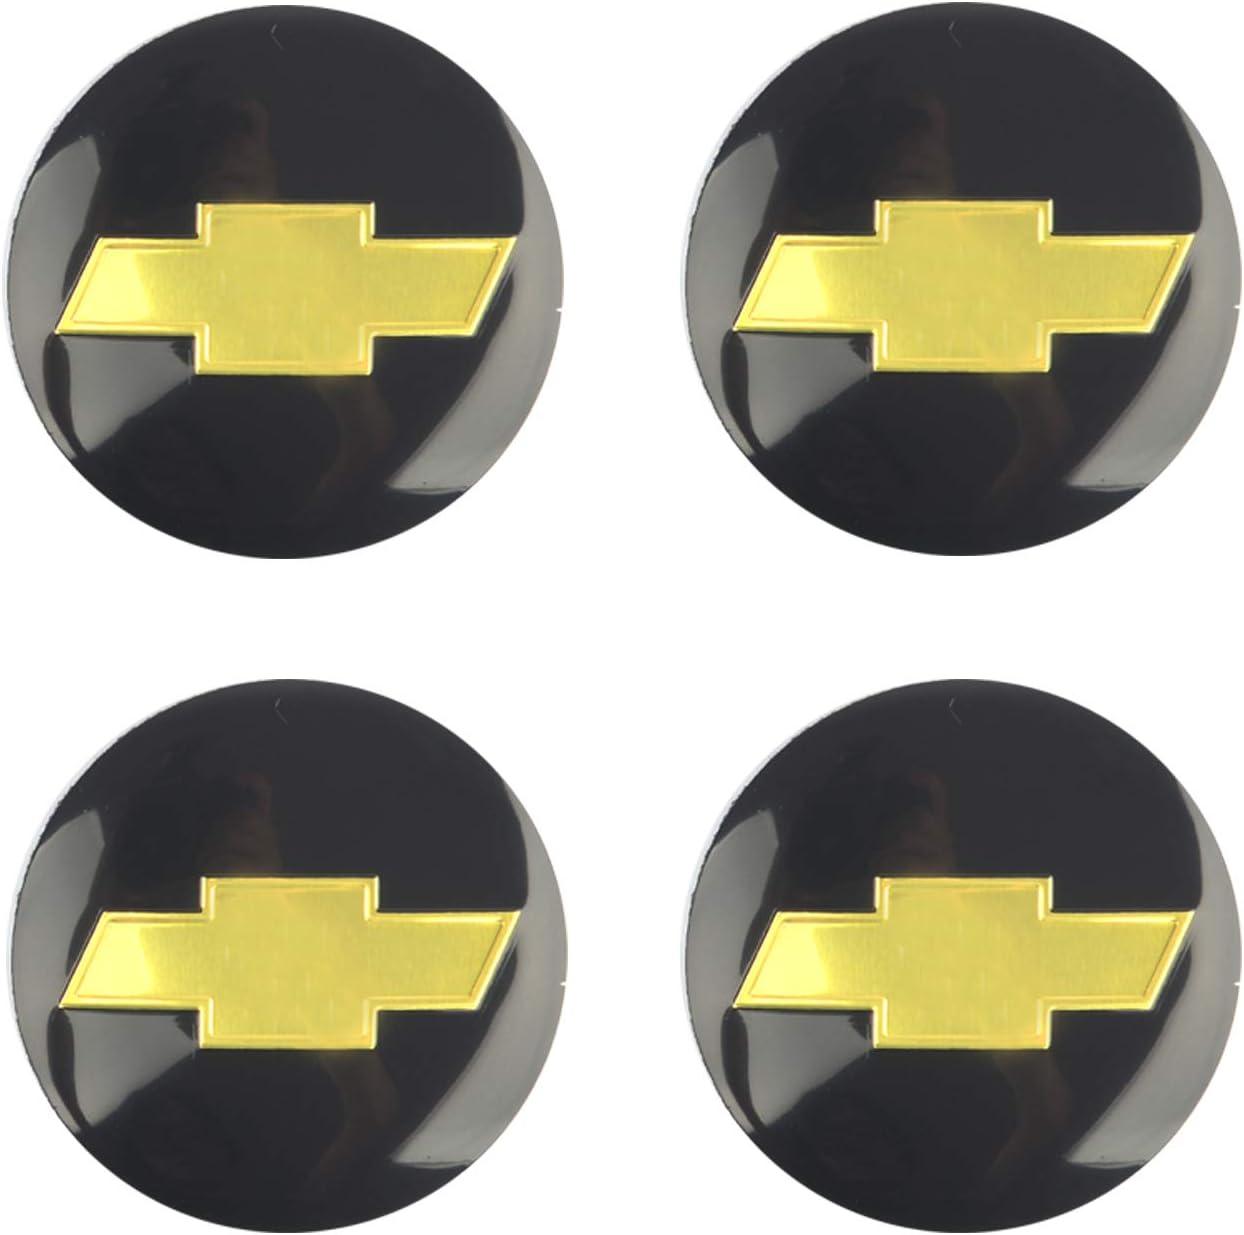 "4x Black Wheel Center Hub Cap Sticker Decal 2.2/"" DOME SHAPE Auto Car"